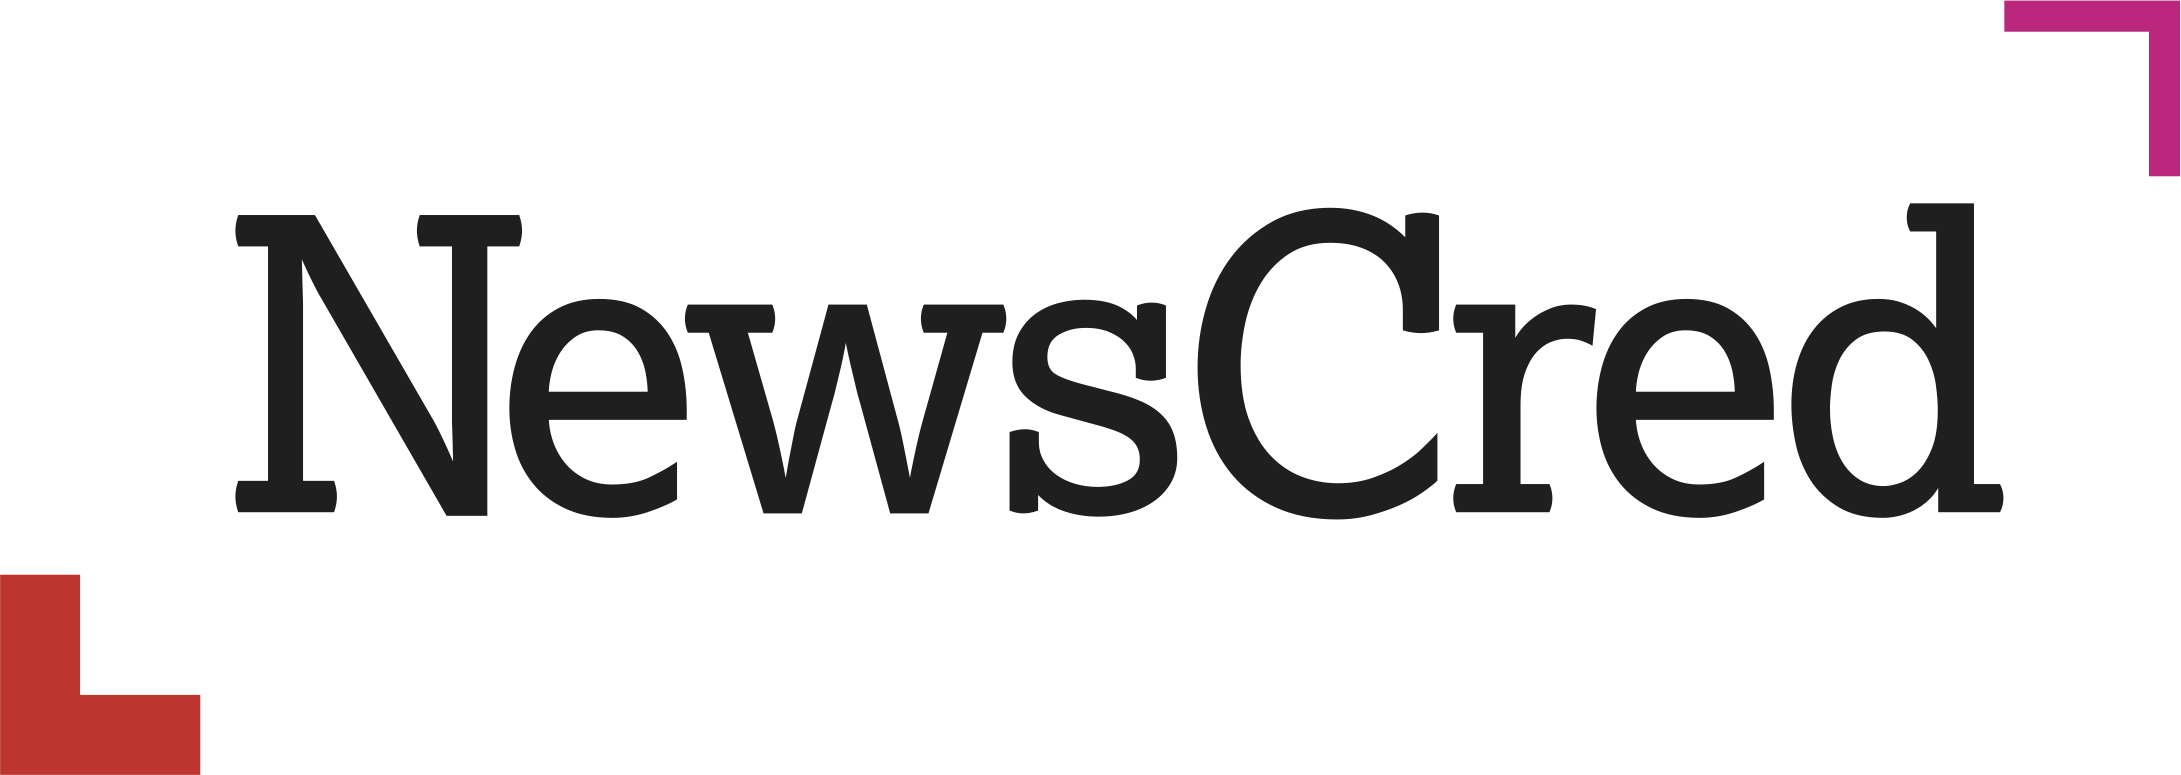 newscred-new-logo-o.png